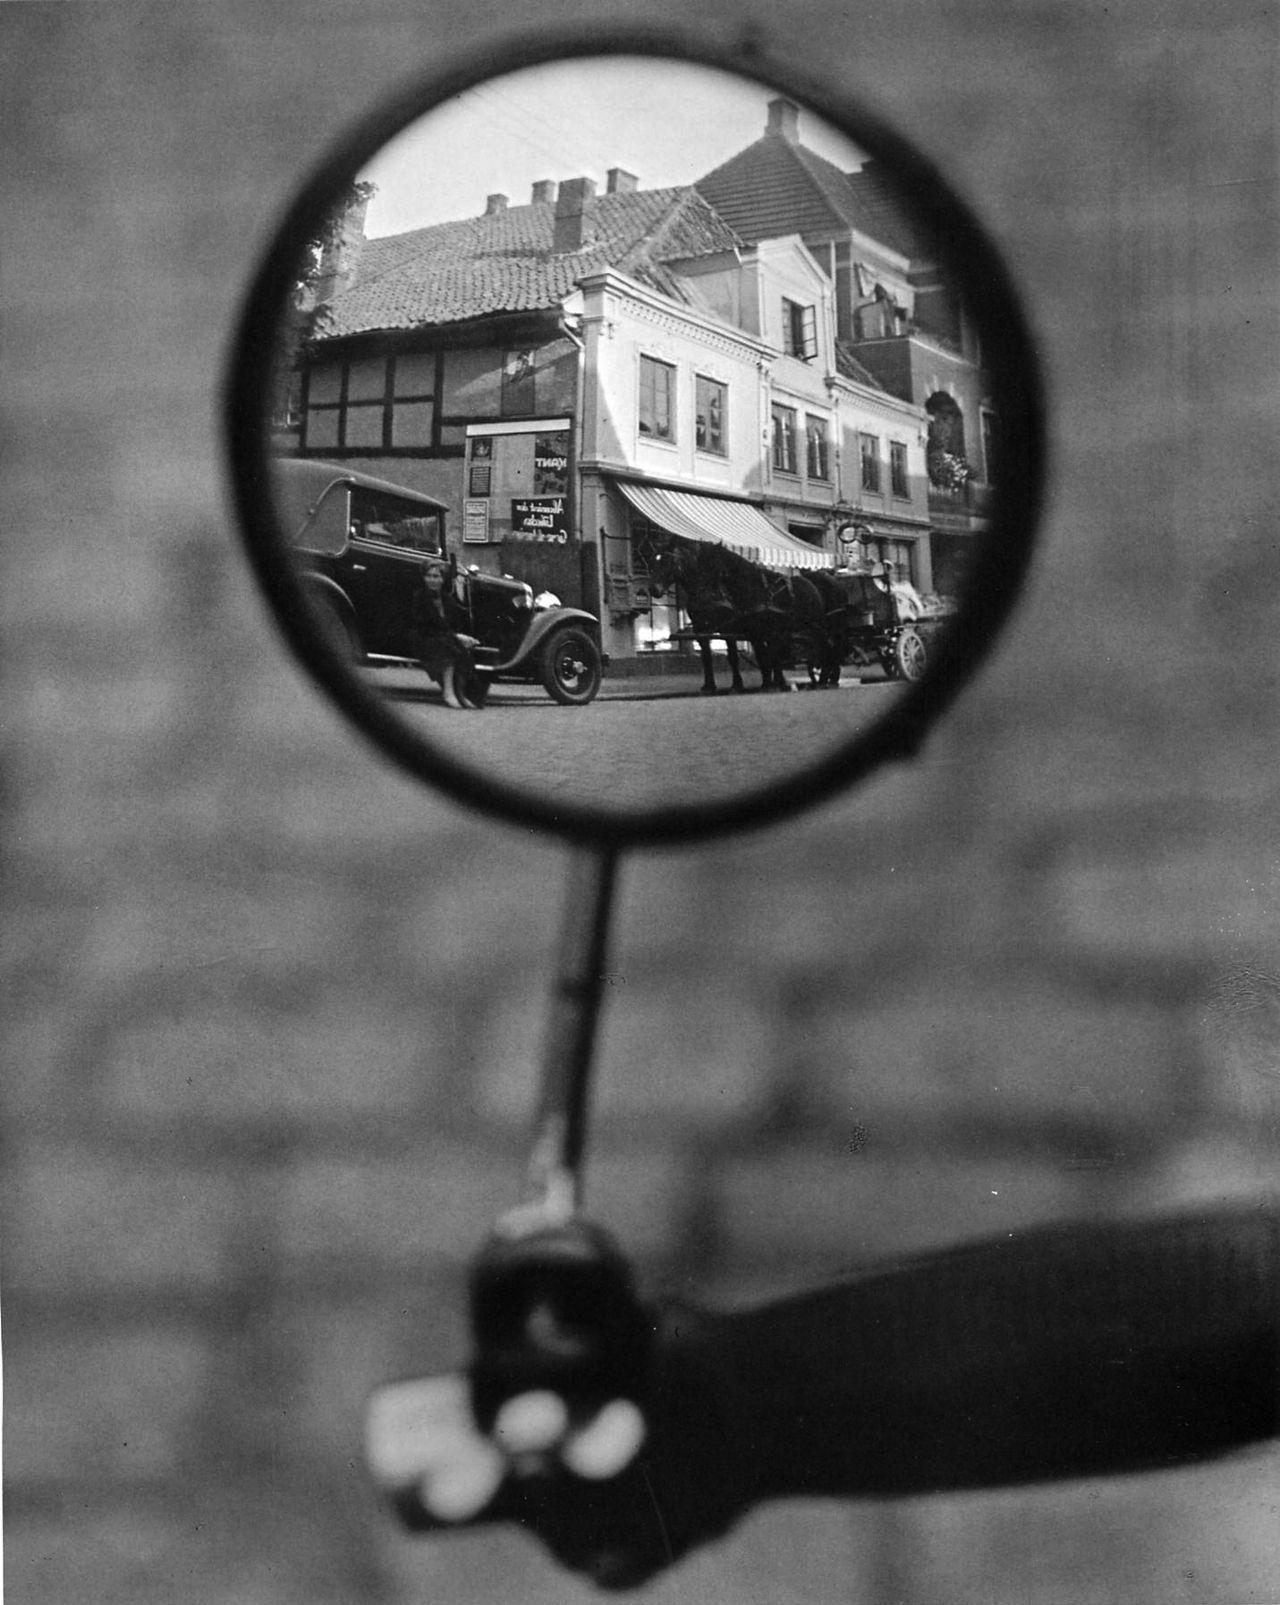 Martin munkacsi reflection in a motorcycle mirror berlin for Mirror reflection